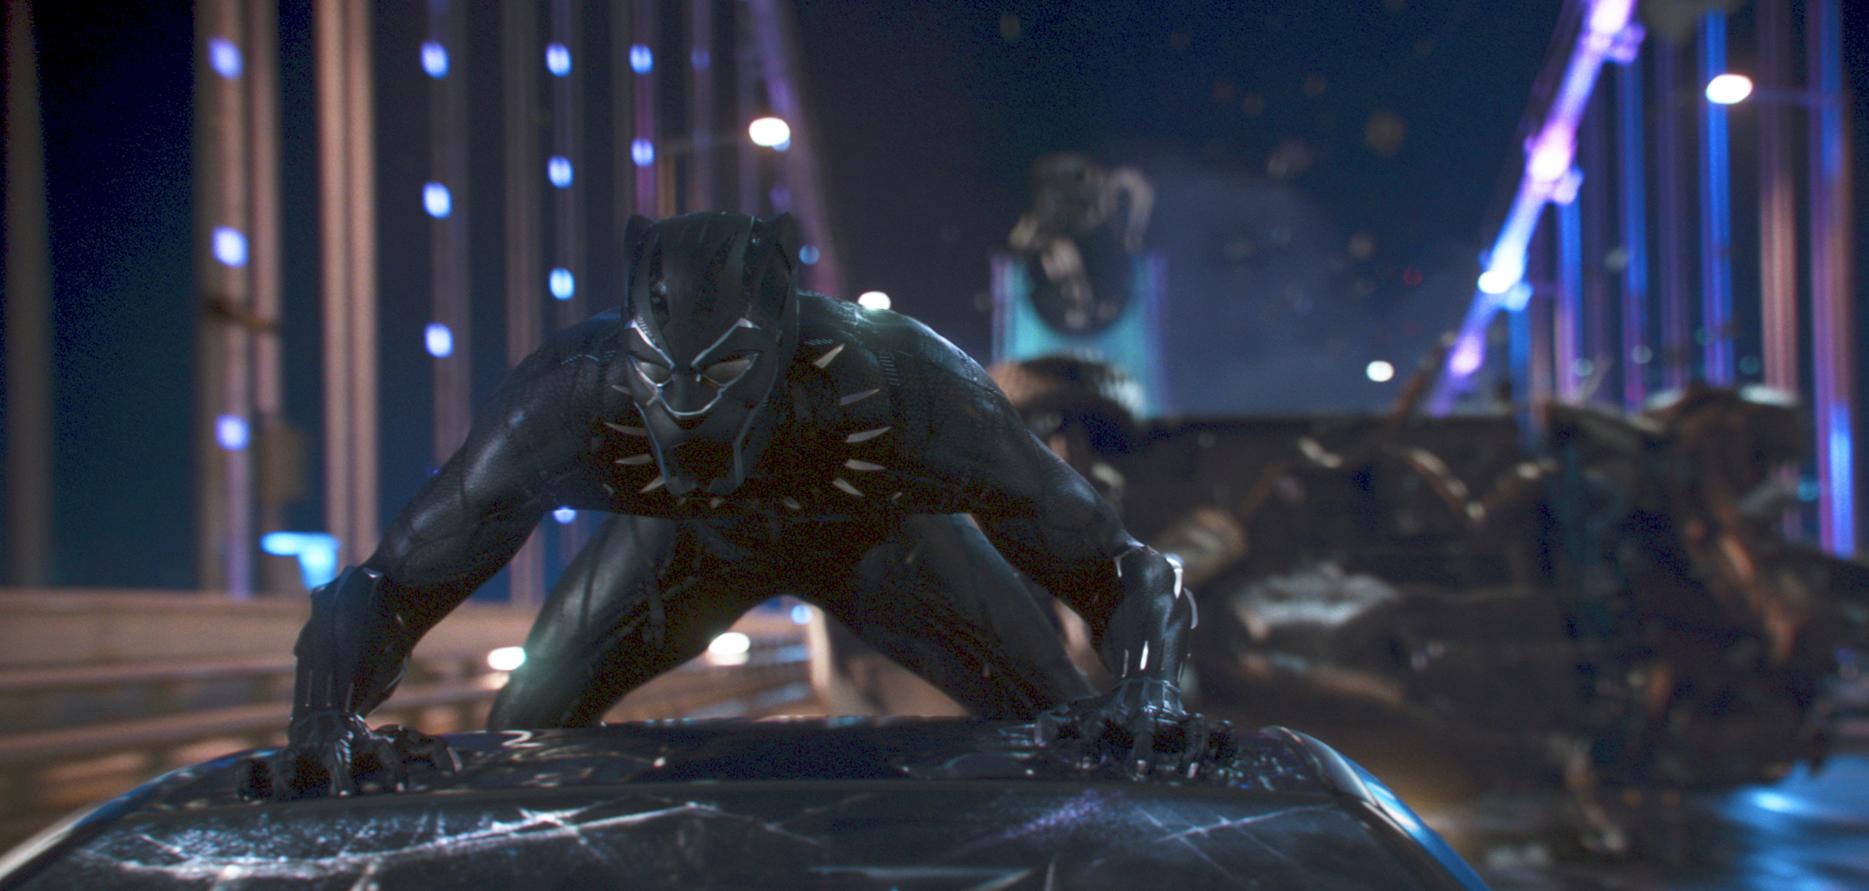 mcu black panther korea SciFi Thrill